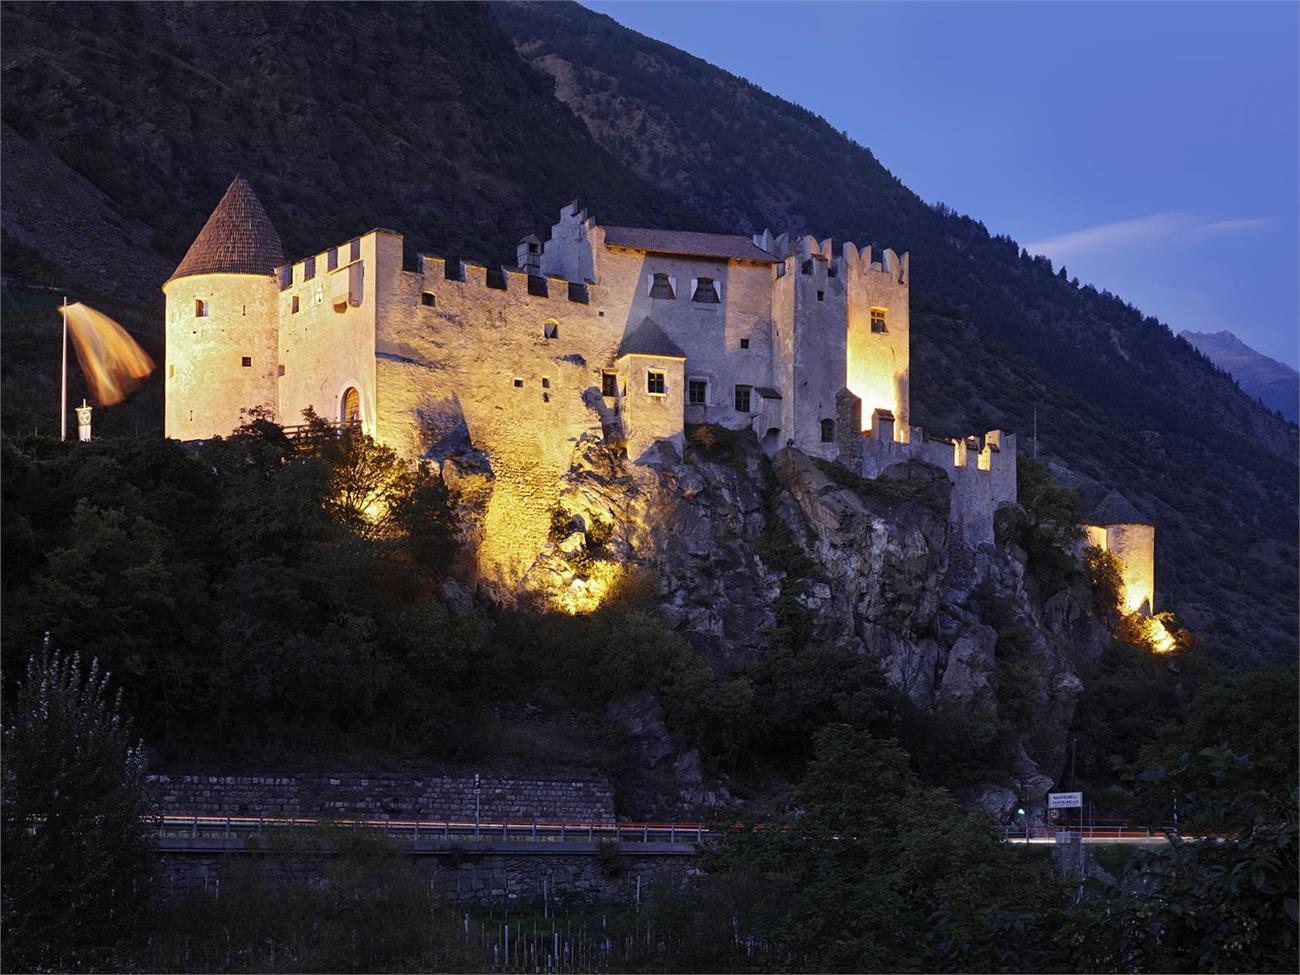 Concert on the Castle of Castelbello - Kastelbell-Tschars /  Castelbello-Ciardes - All dates